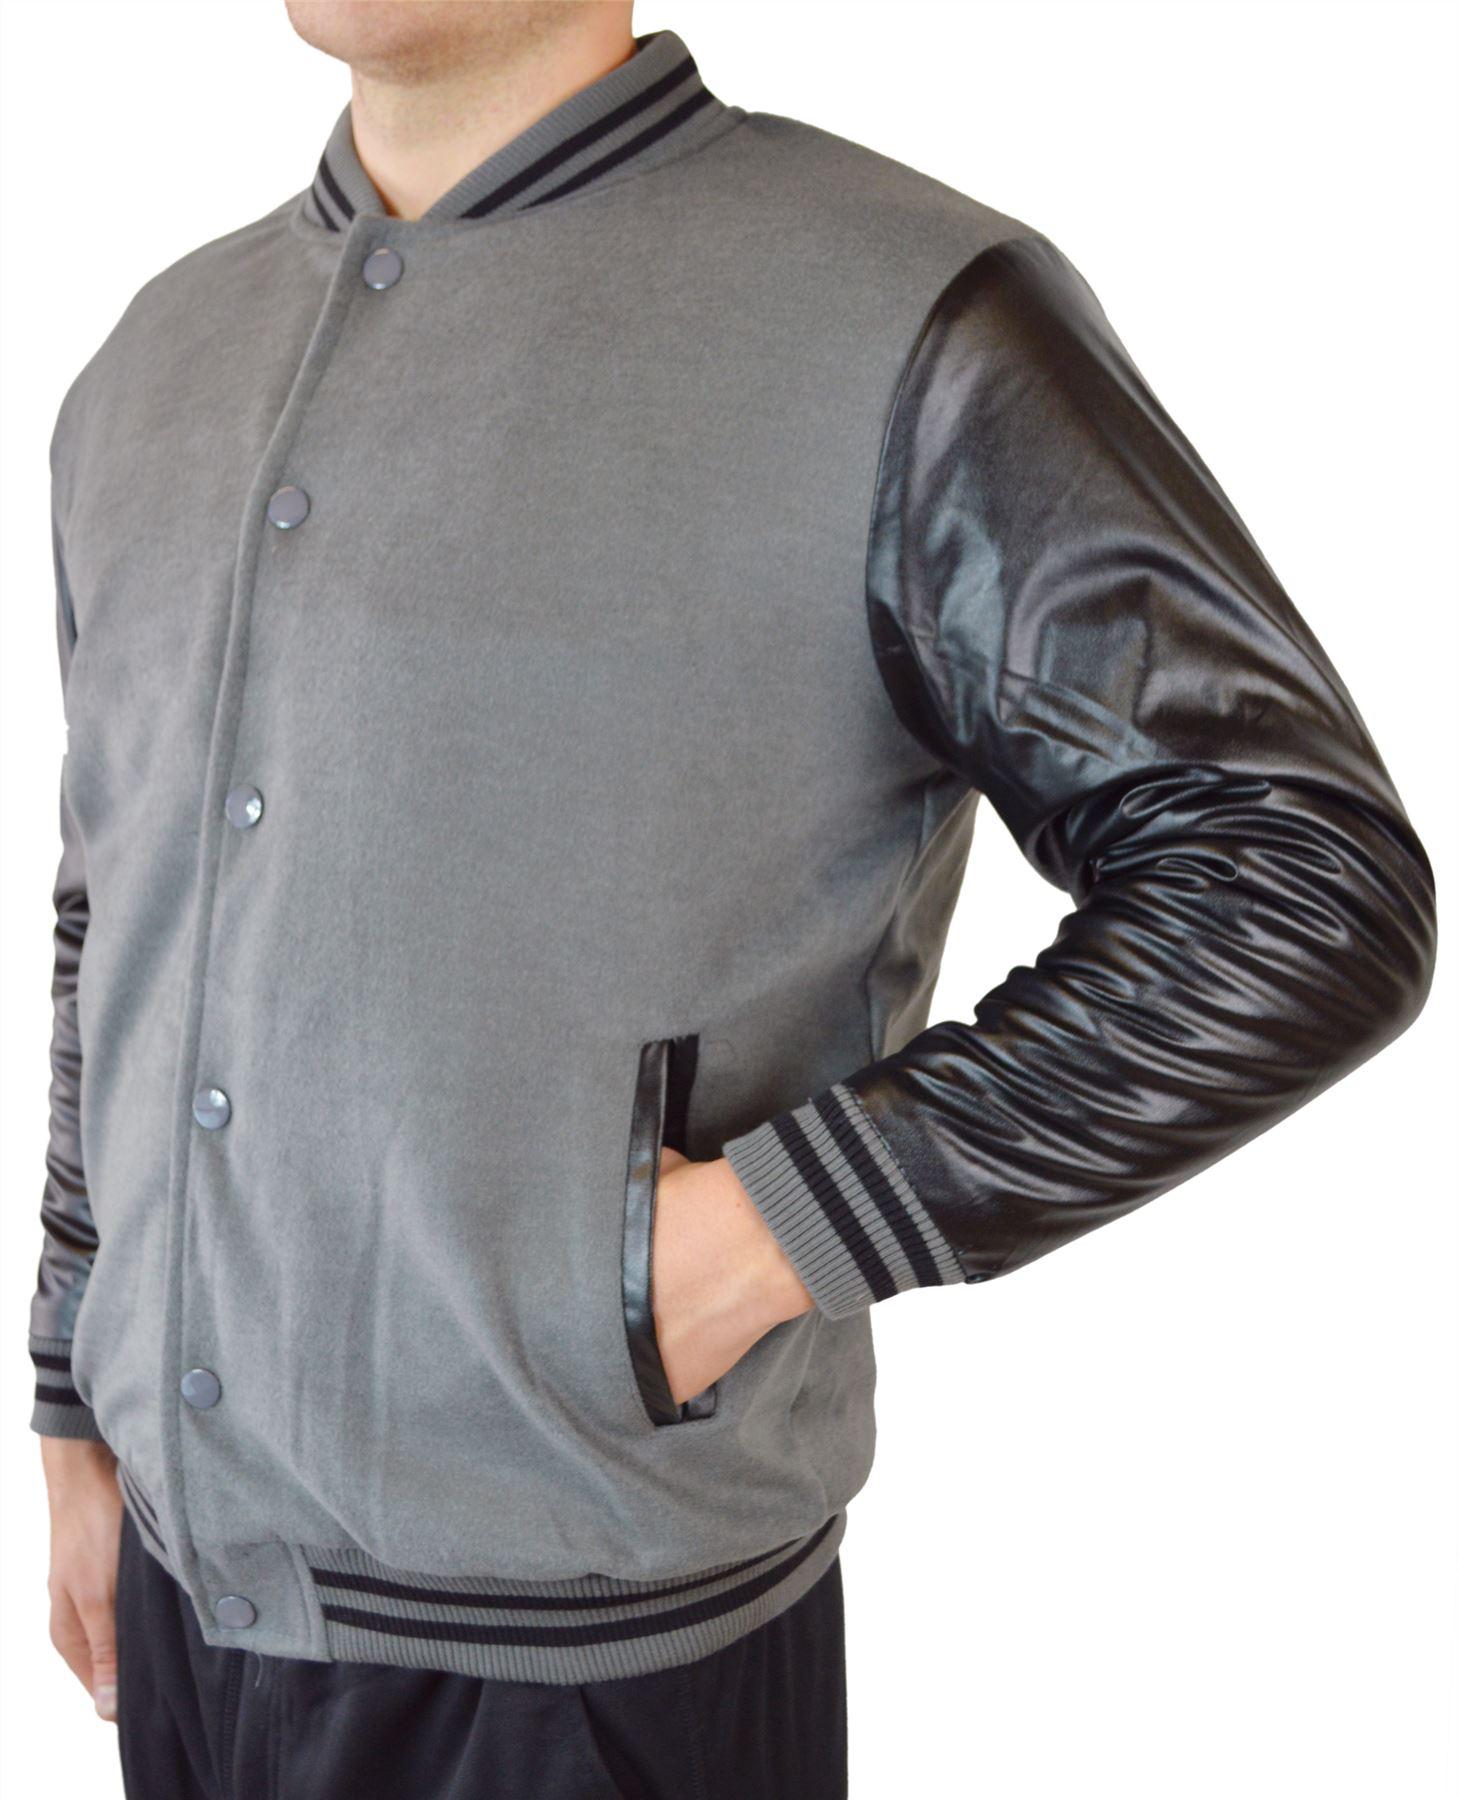 New Maximos Mens Letterman Varsity Two Tone Baseball Jacket Bomber Jaket Unisex Nevy Condition With Tags